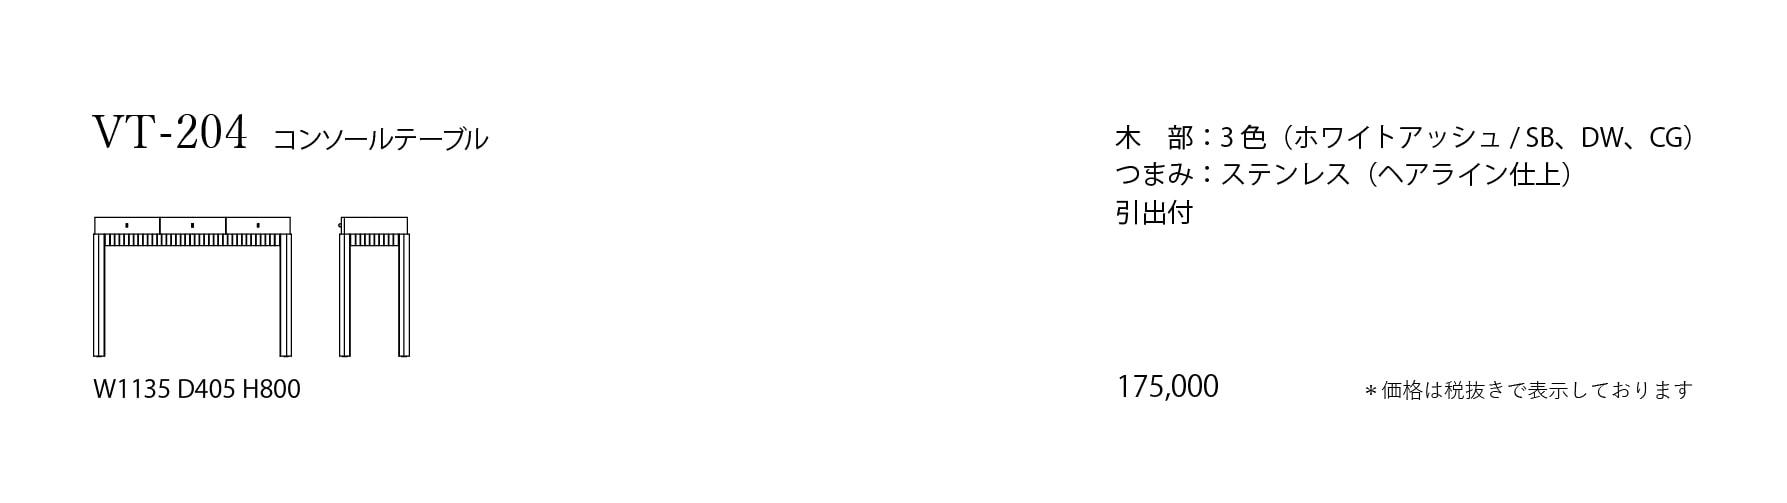 VT-204 Price List